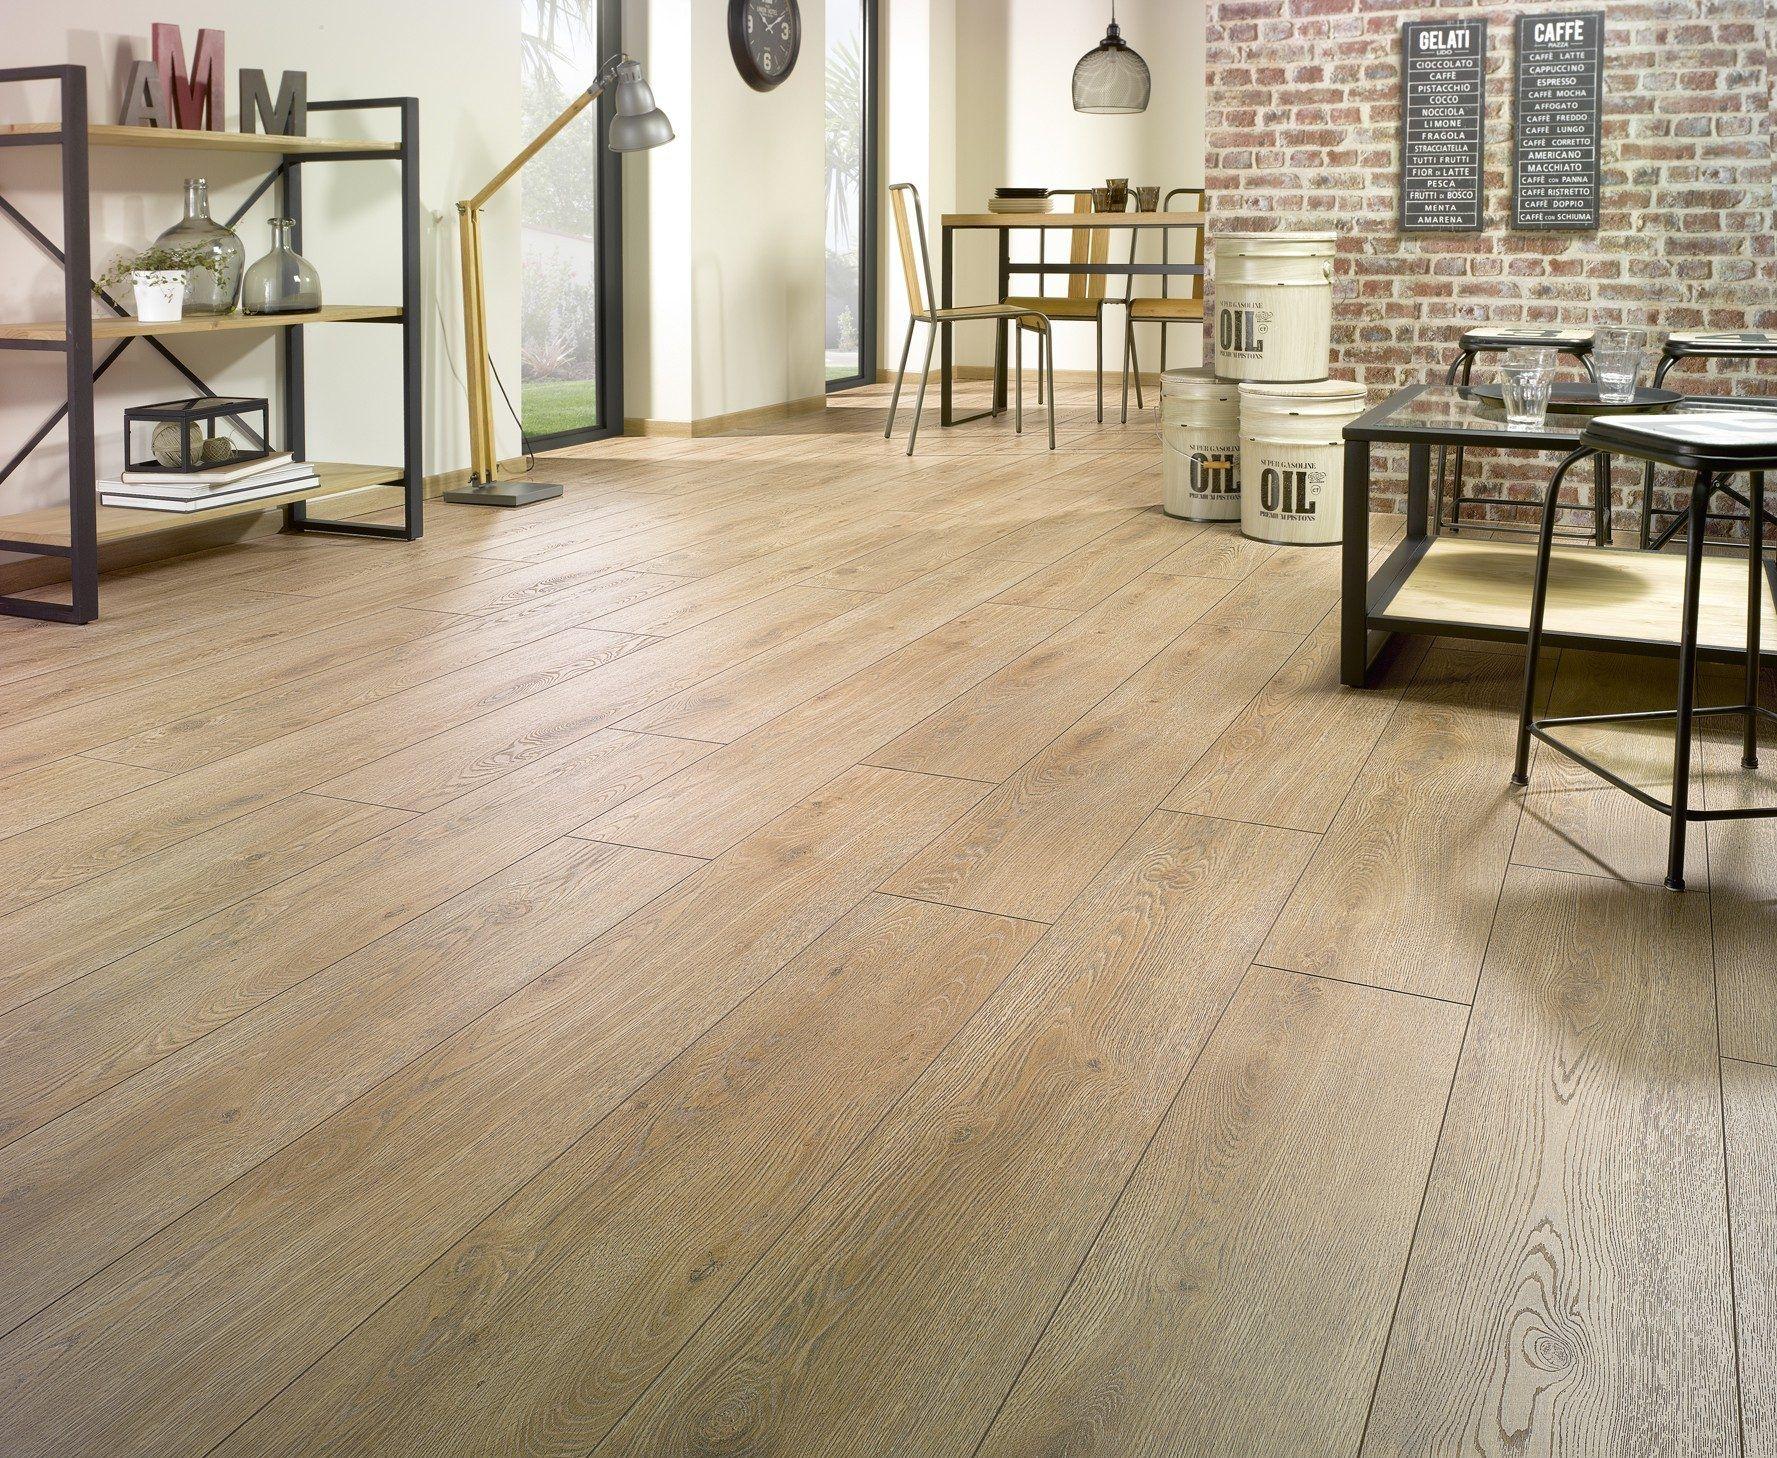 Panel Podlogowy Ac6 12mm 4v 1 651m2 Dab Pralin Blonde Flooring Flooring White Interior Design